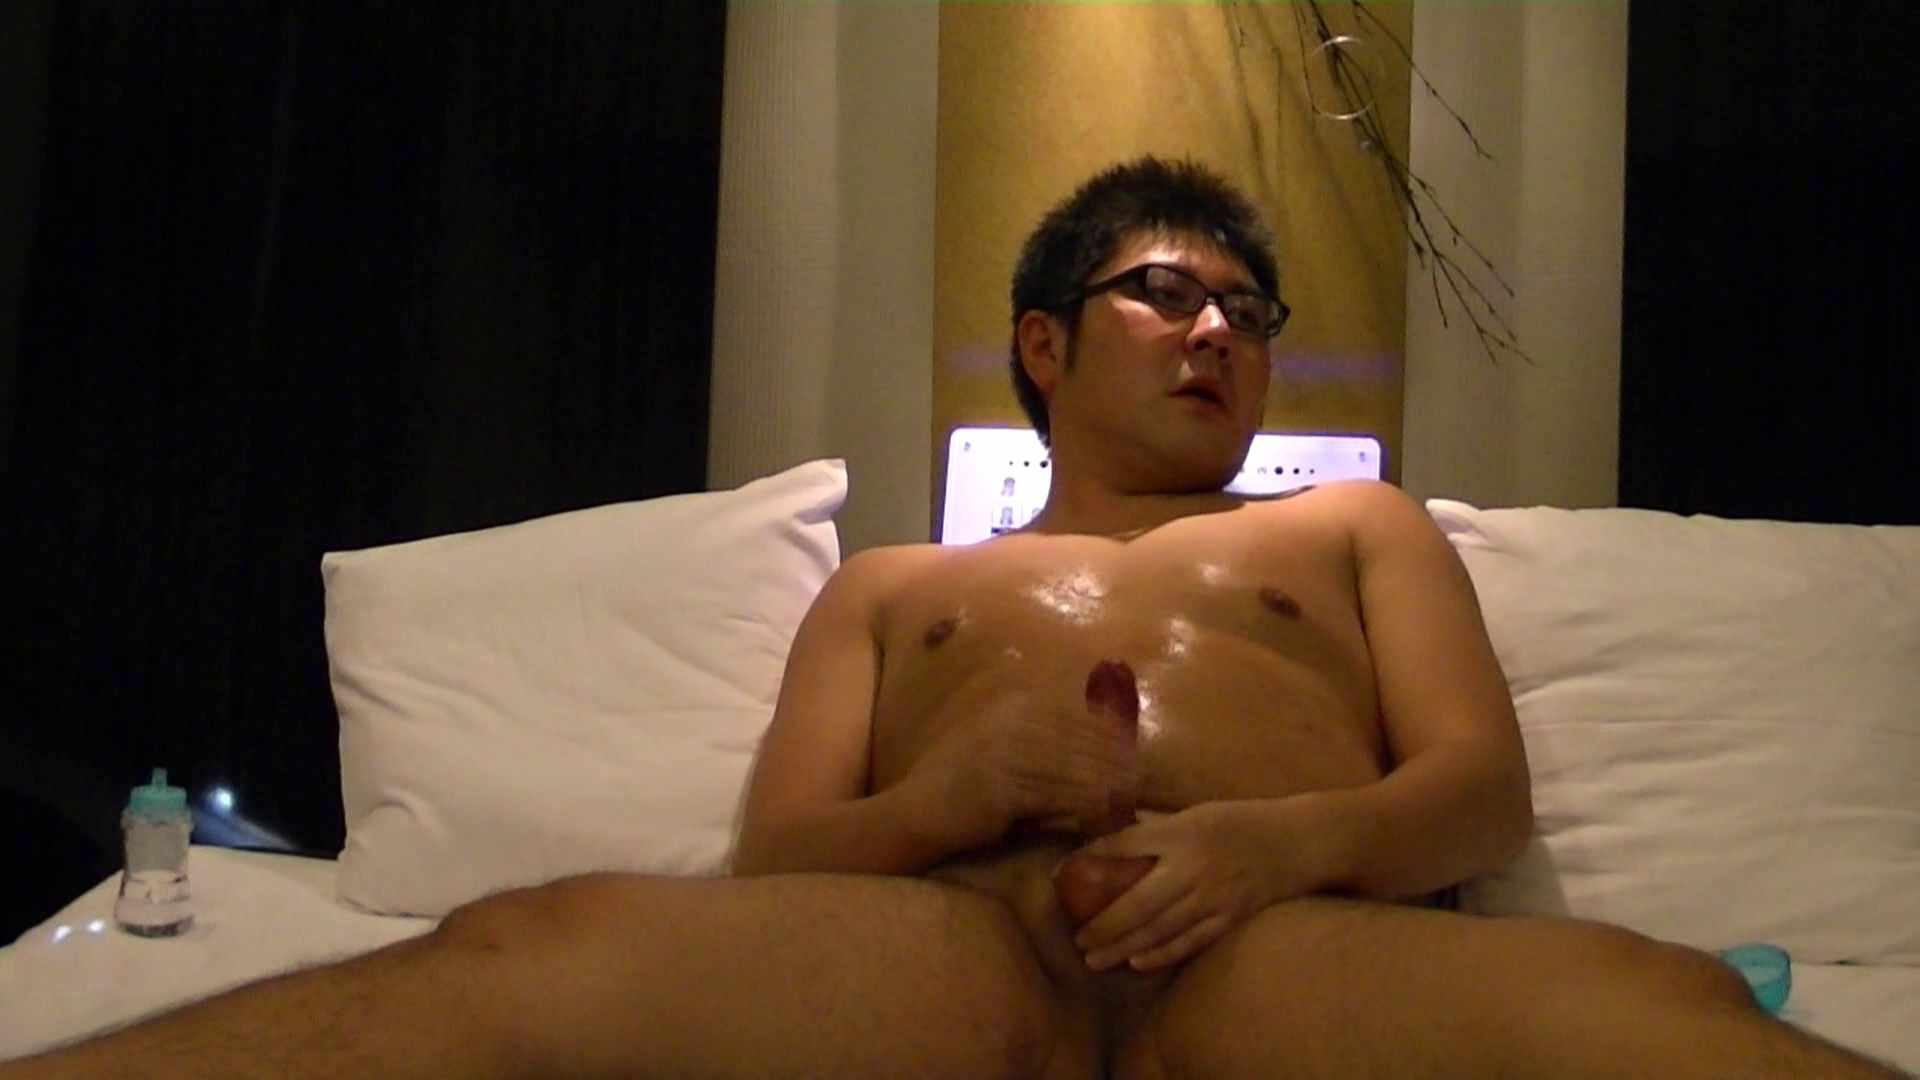 Mr.オナックスさん投稿!HD 貴方のオナニー三万円で撮影させてください。VOL.03 後編 完全無修正でお届け | オナニー特集  83pic 31